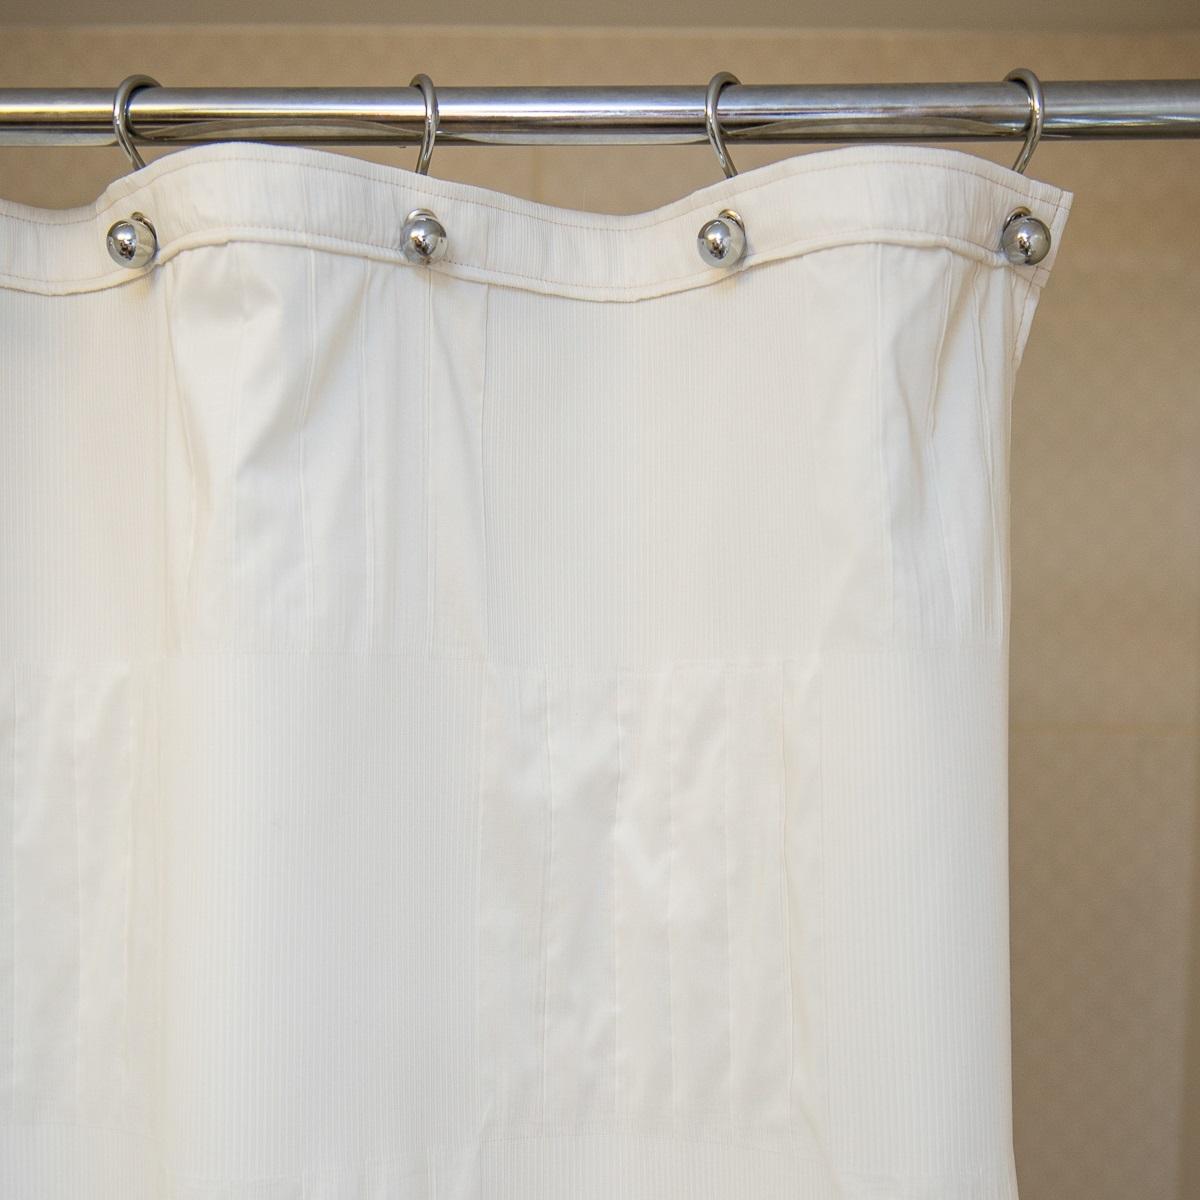 Шторки Элитная шторка для ванной 200х240 Cairo Beige от Arti-Deco elitnaya-shtorka-dlya-vannoy-200h240-cairo-beige-ot-arti-deco-ispaniya.jpg